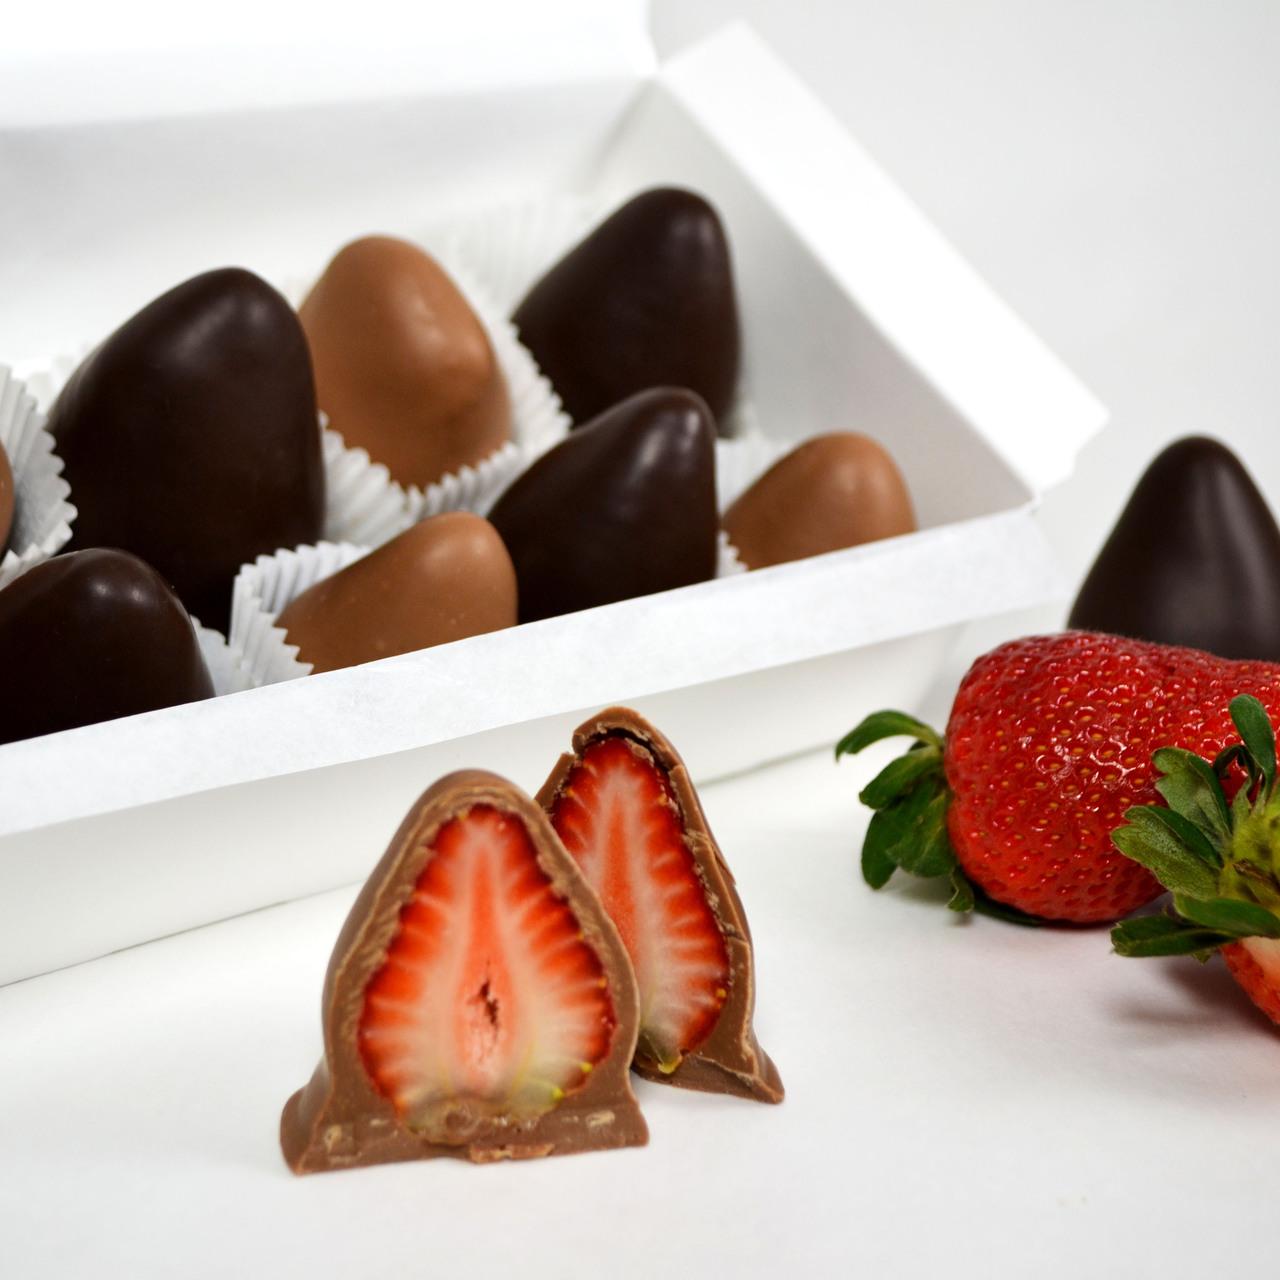 Chocolate Covered Strawberries - The Chocolatier